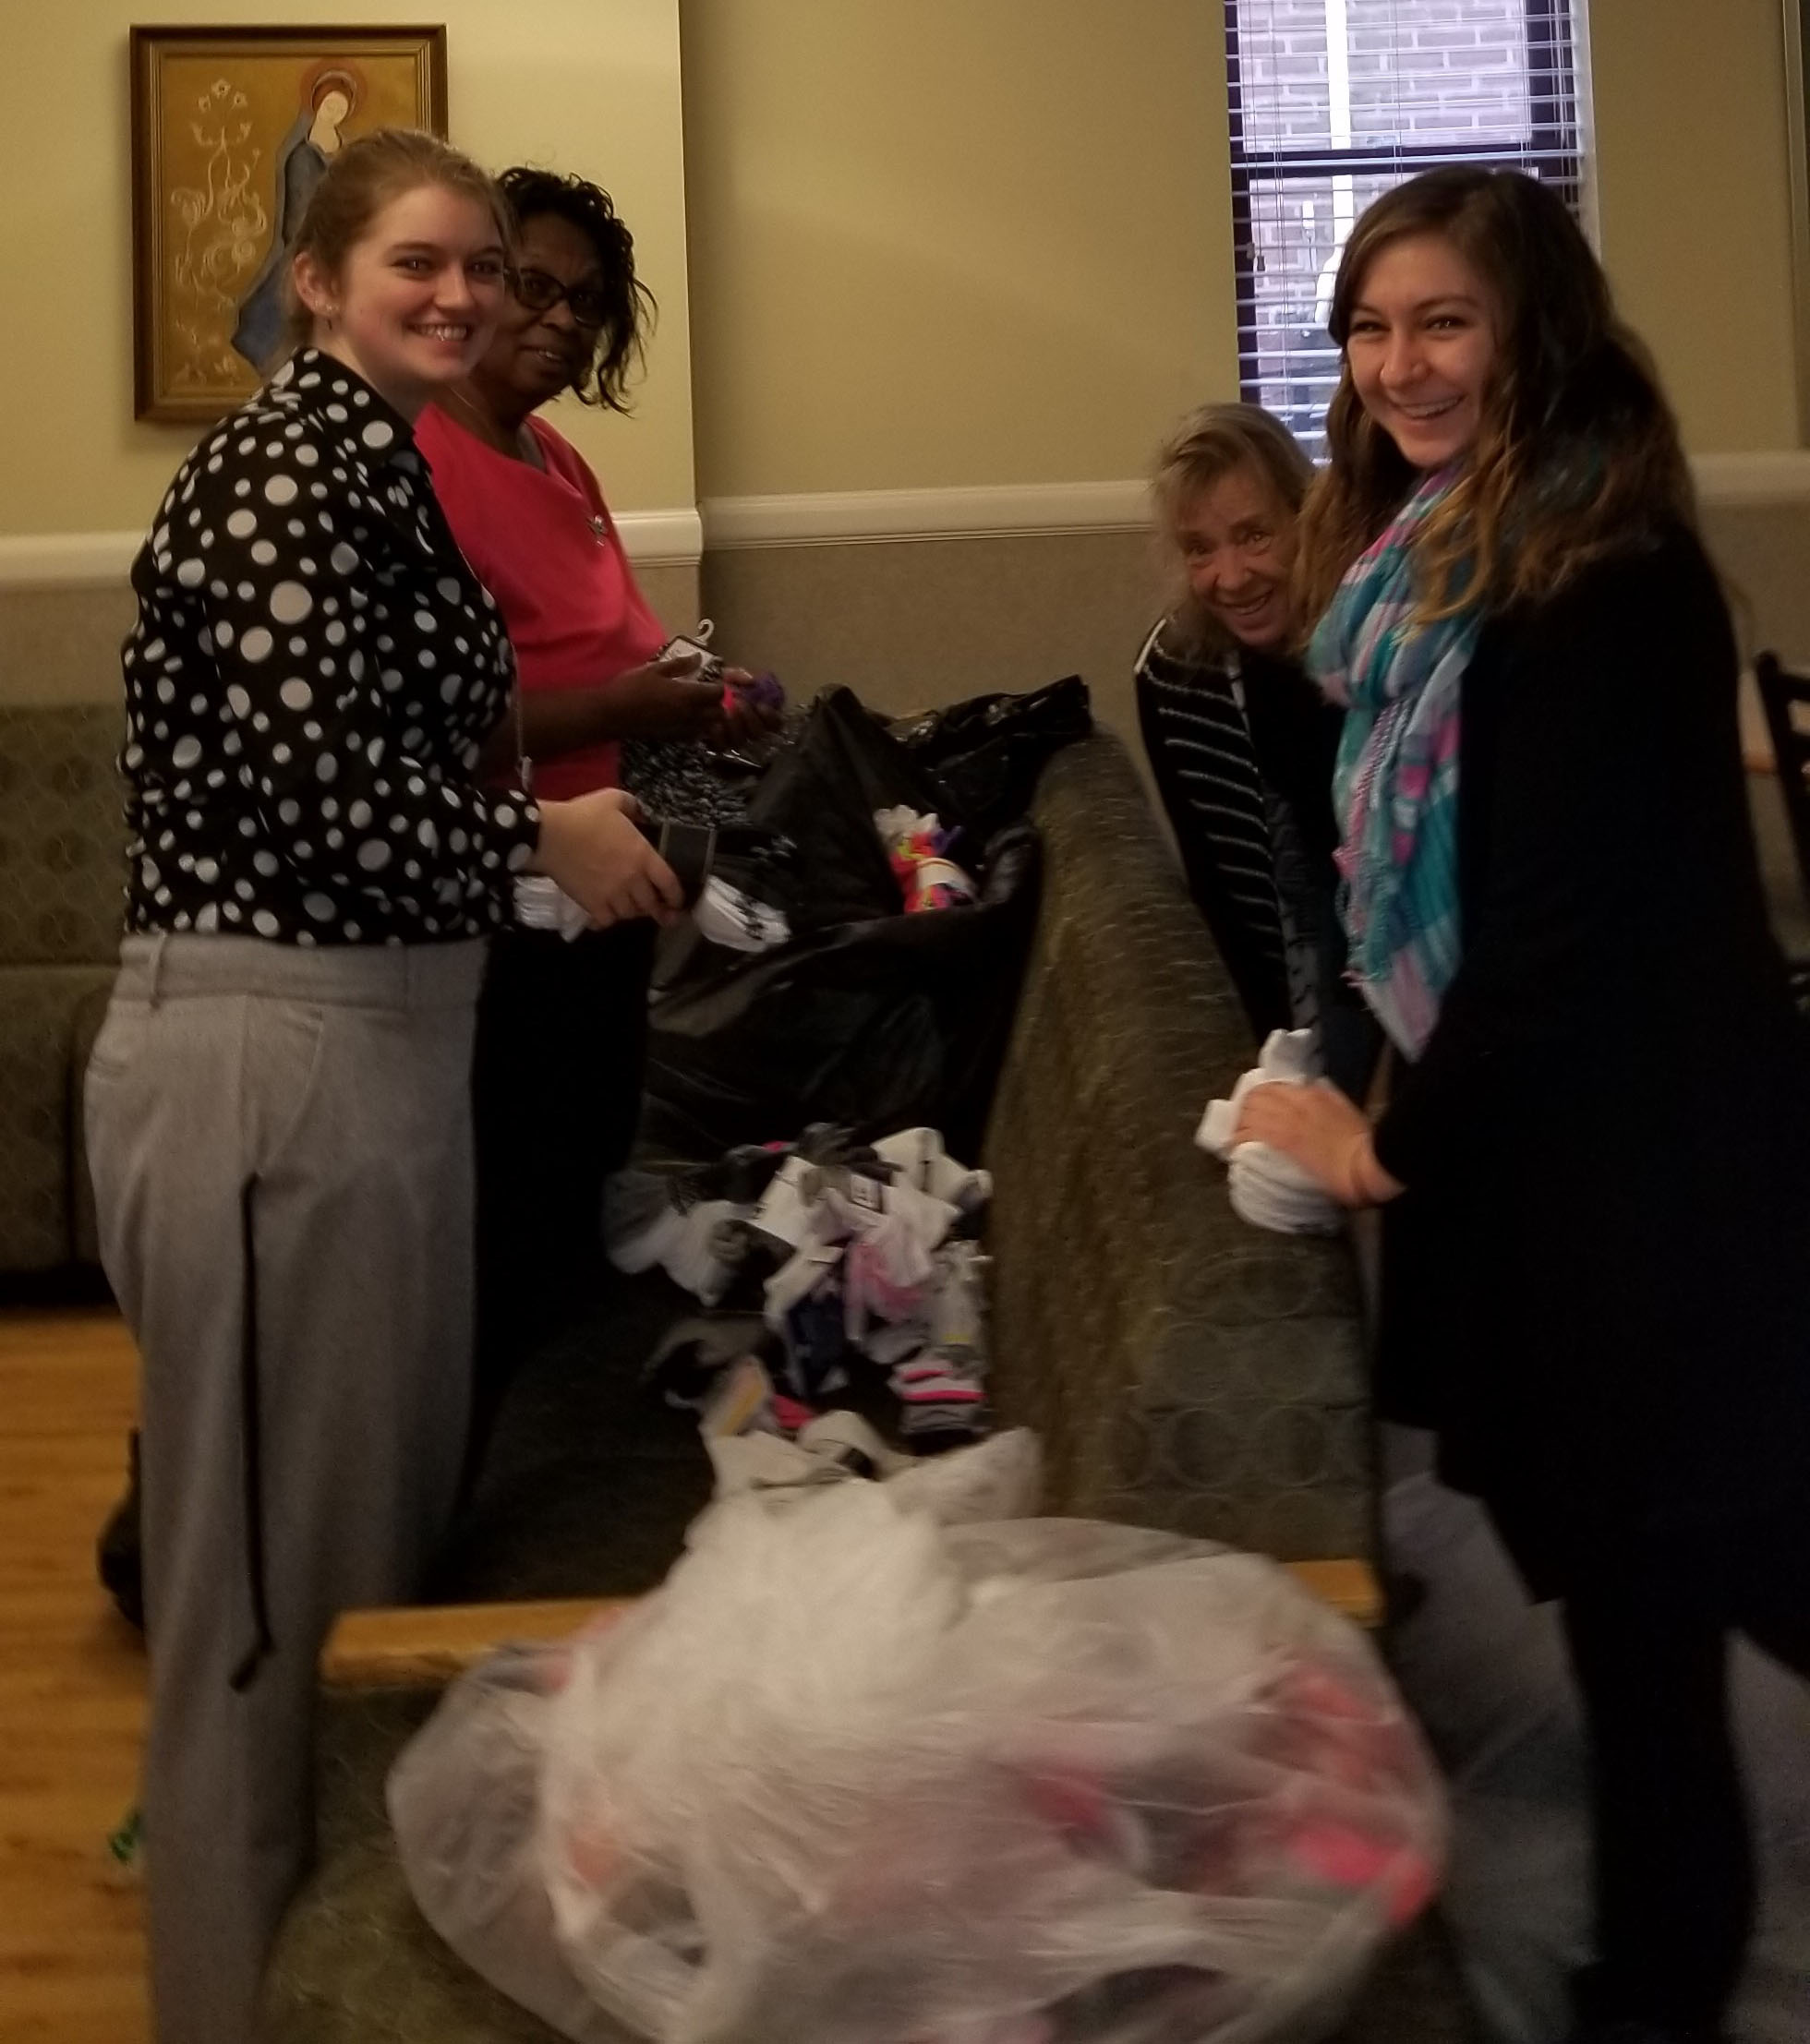 Jordan McCutcheon led her middle school in a sock donation drive